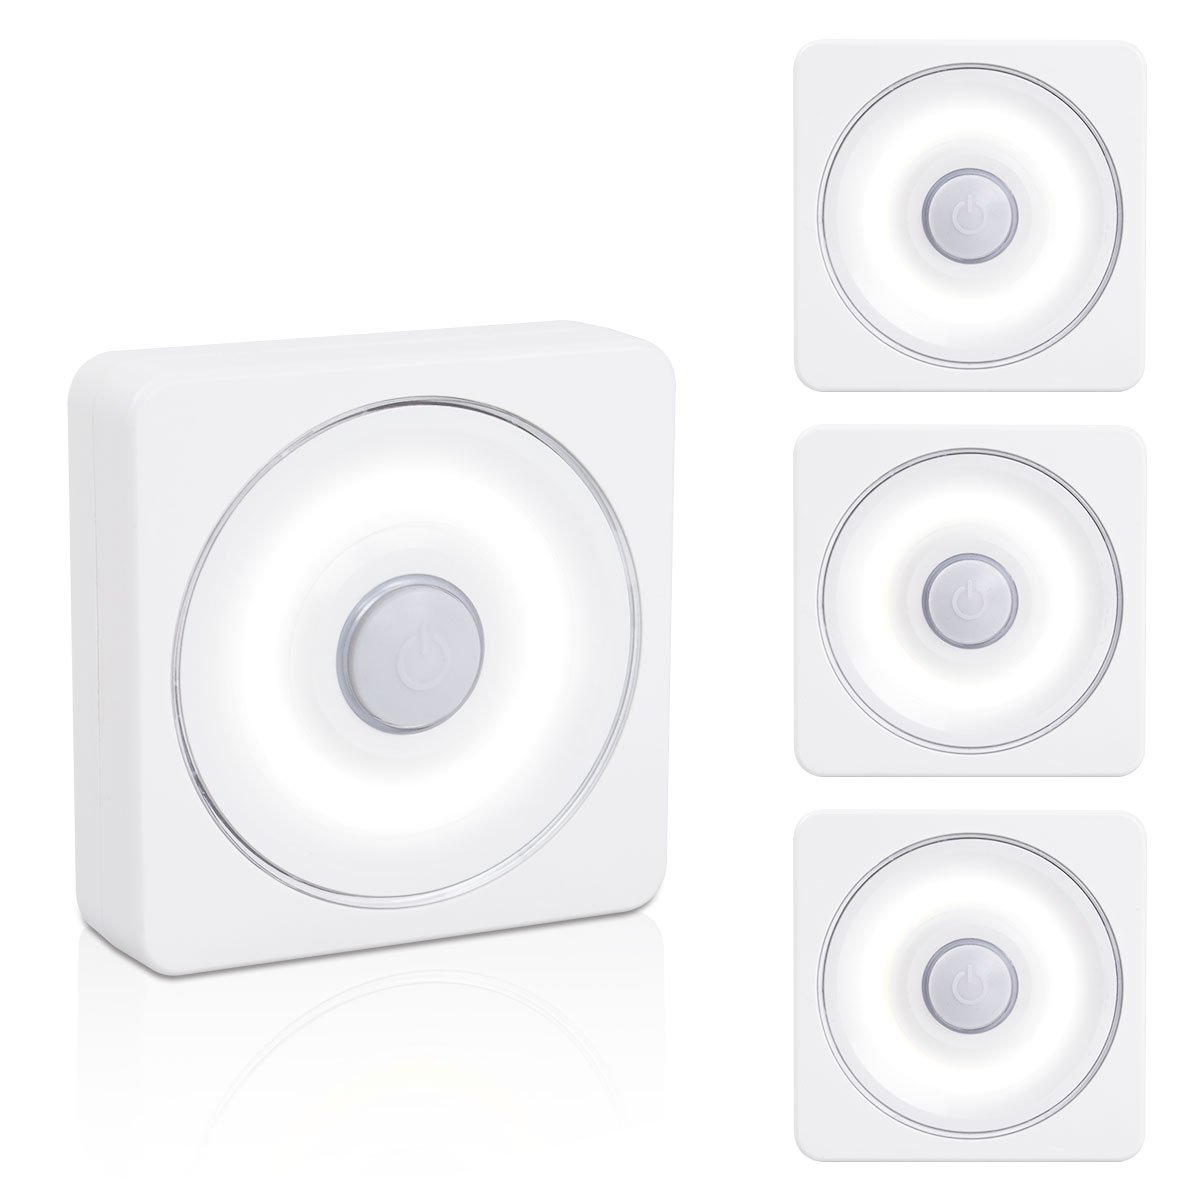 VIBELITE Tap Light, Closet light, Touch Battery-Powered LED Night Light, Magnet Stick-on Anywhere Stair light, Safe Lights for Hallway, Bedroom, Cabinets, etc. (White - Pack of 4)